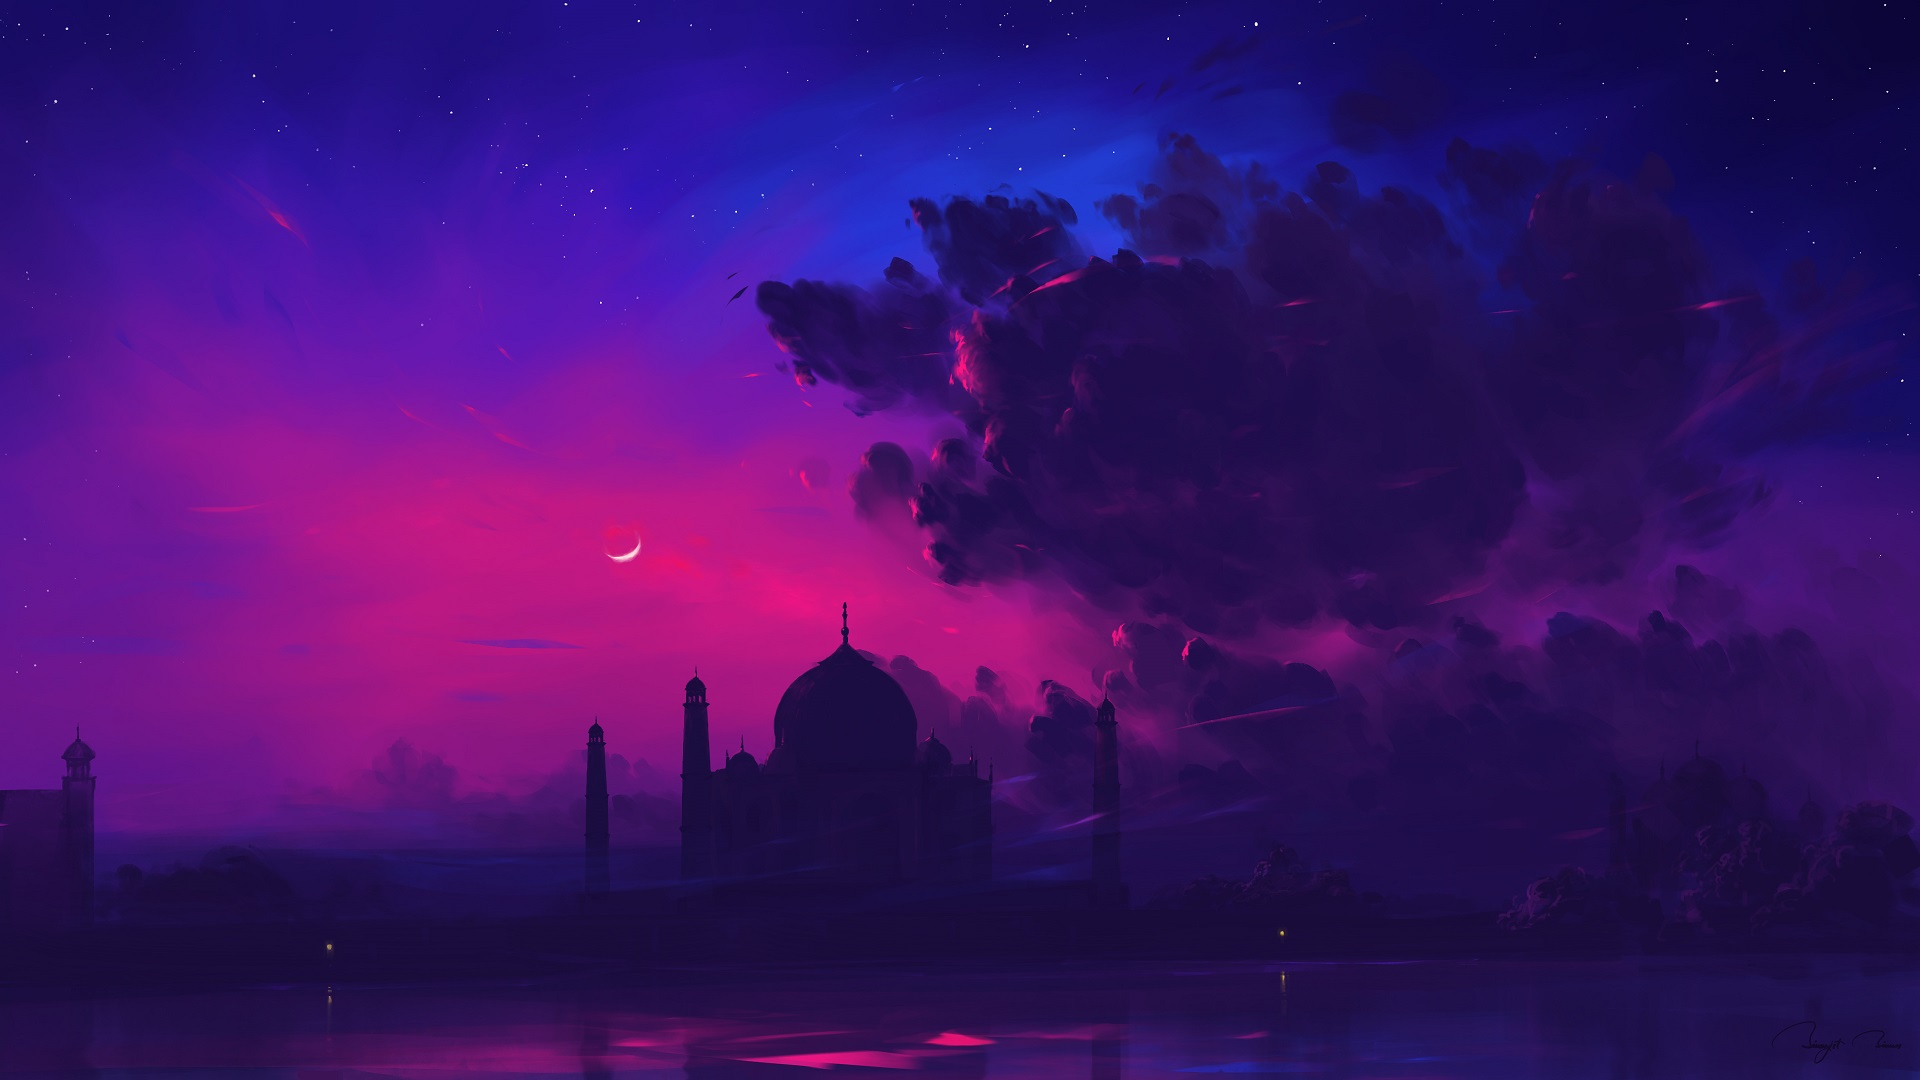 General 1920x1080 BisBiswas Taj Mahal digital art landscape Indian Architecture purple